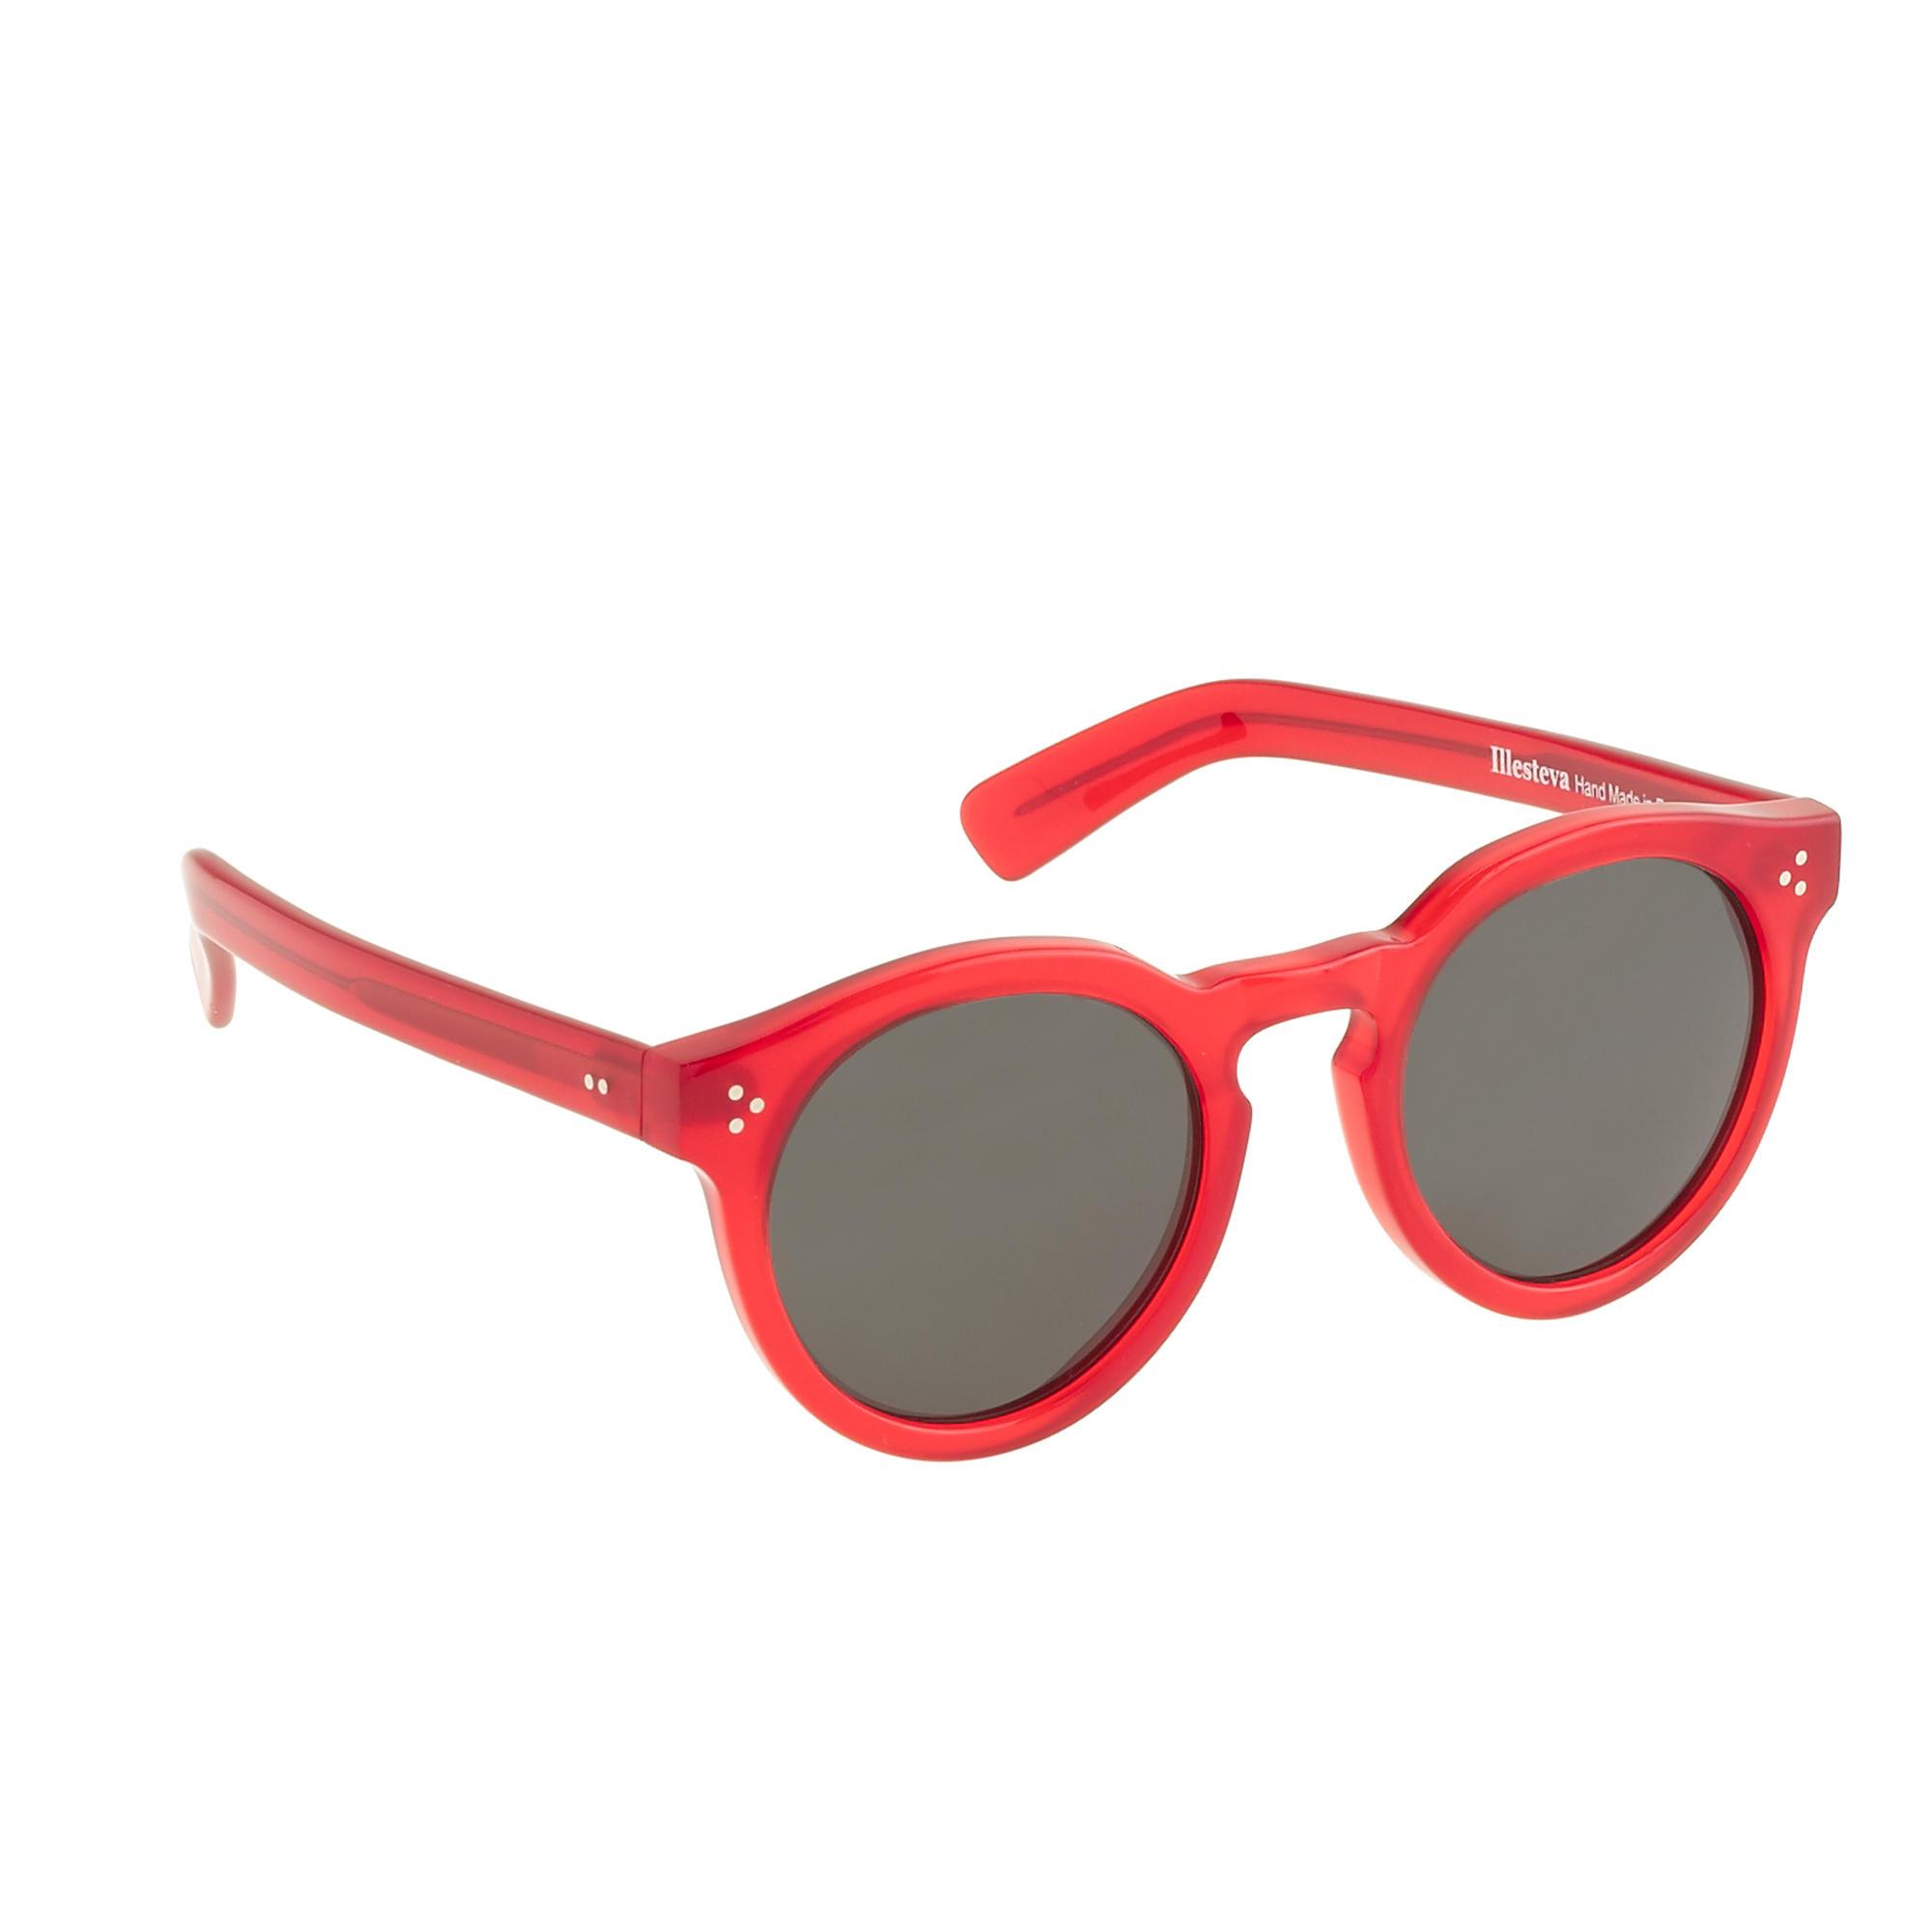 Red Sunglasses  j crew illesteva leonard ii red sunglasses in red lyst